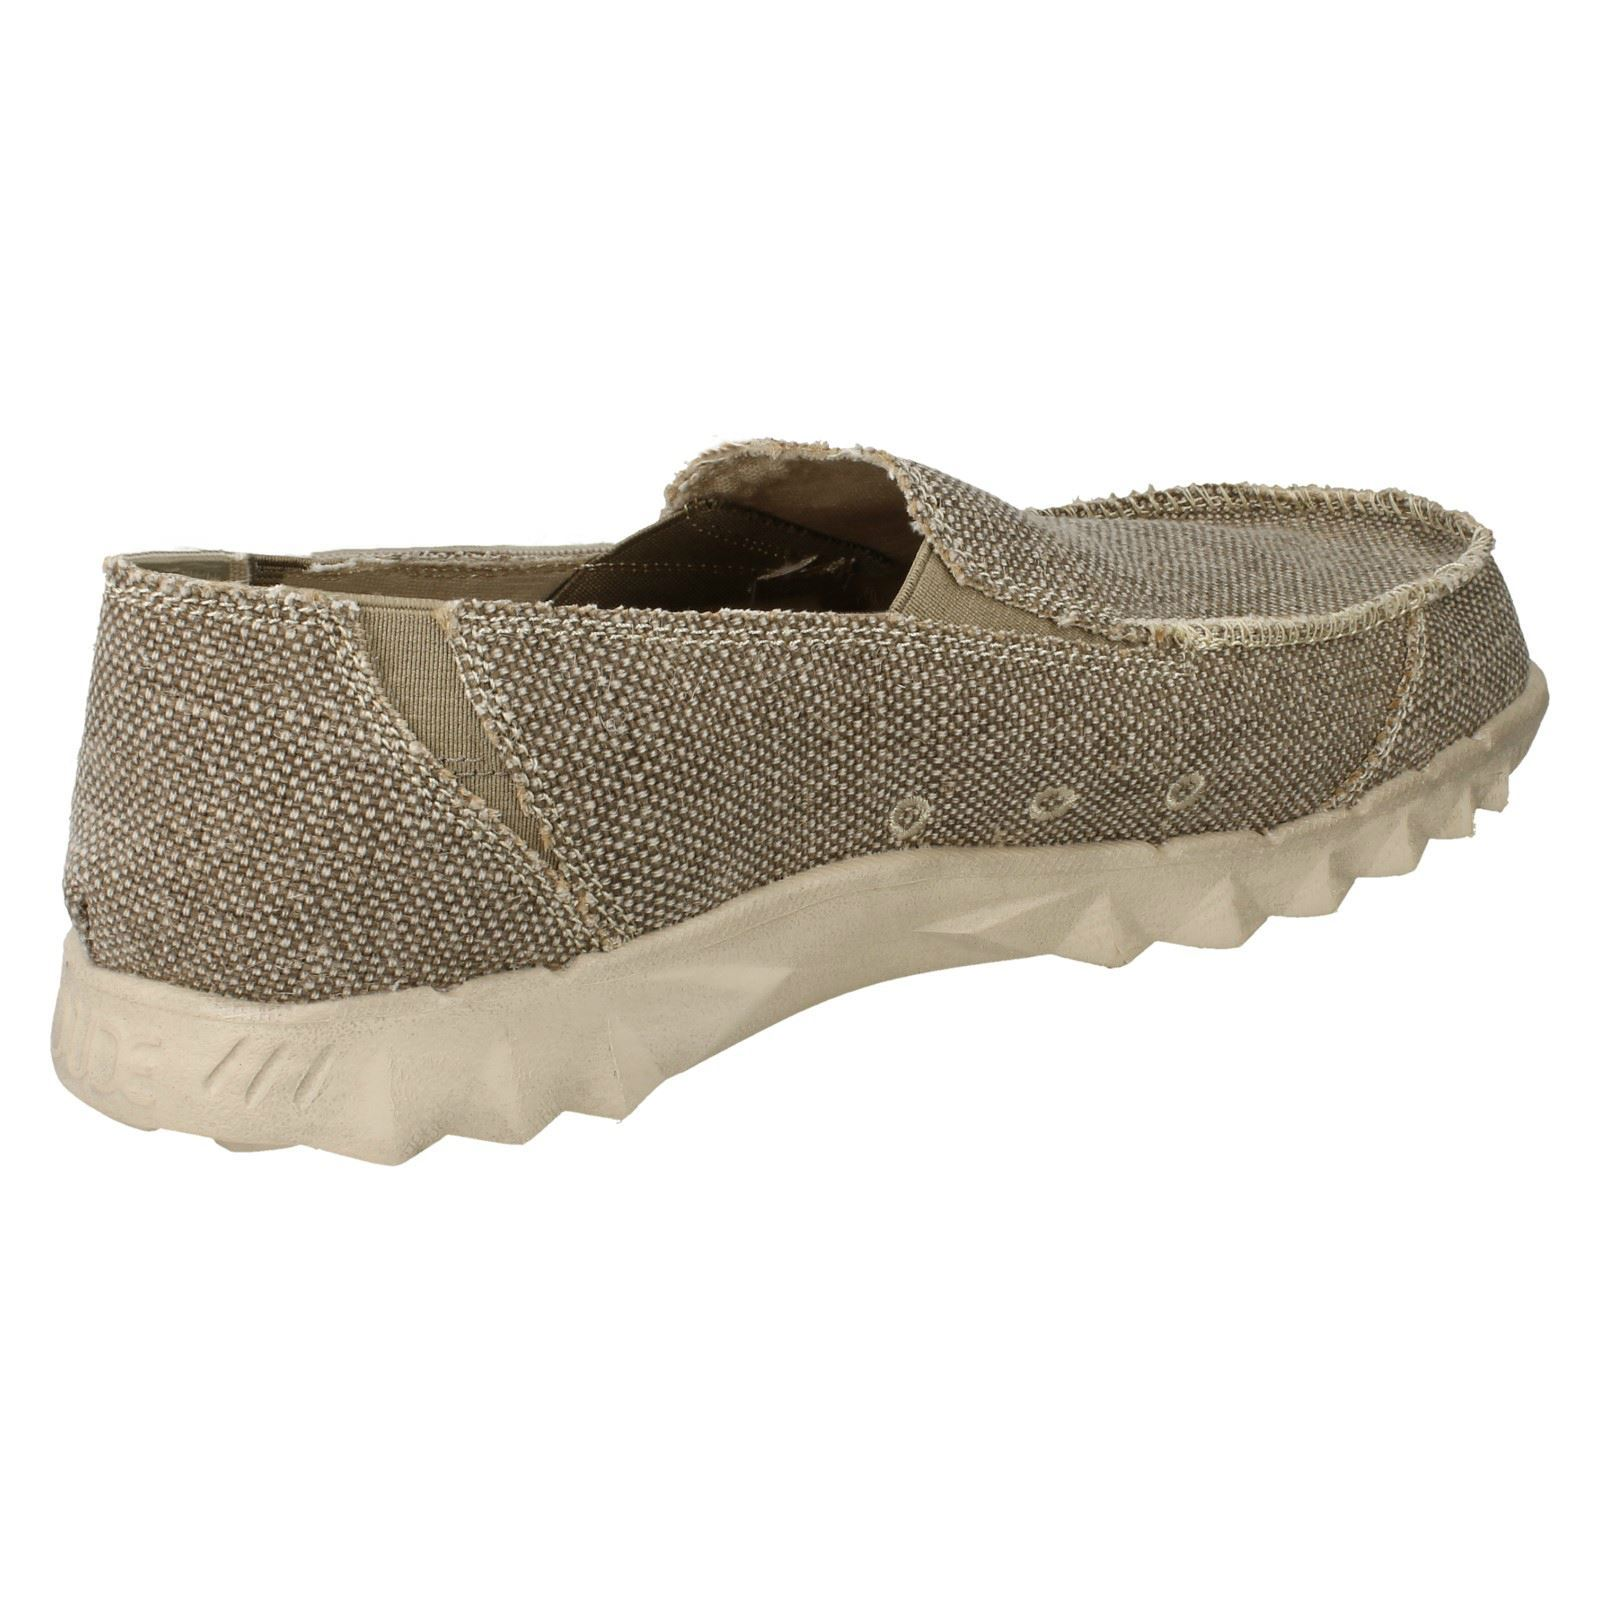 Mens Hey Dude Braided Slip On Shoe Style Farty Braided Dude ~ N 1ff25e